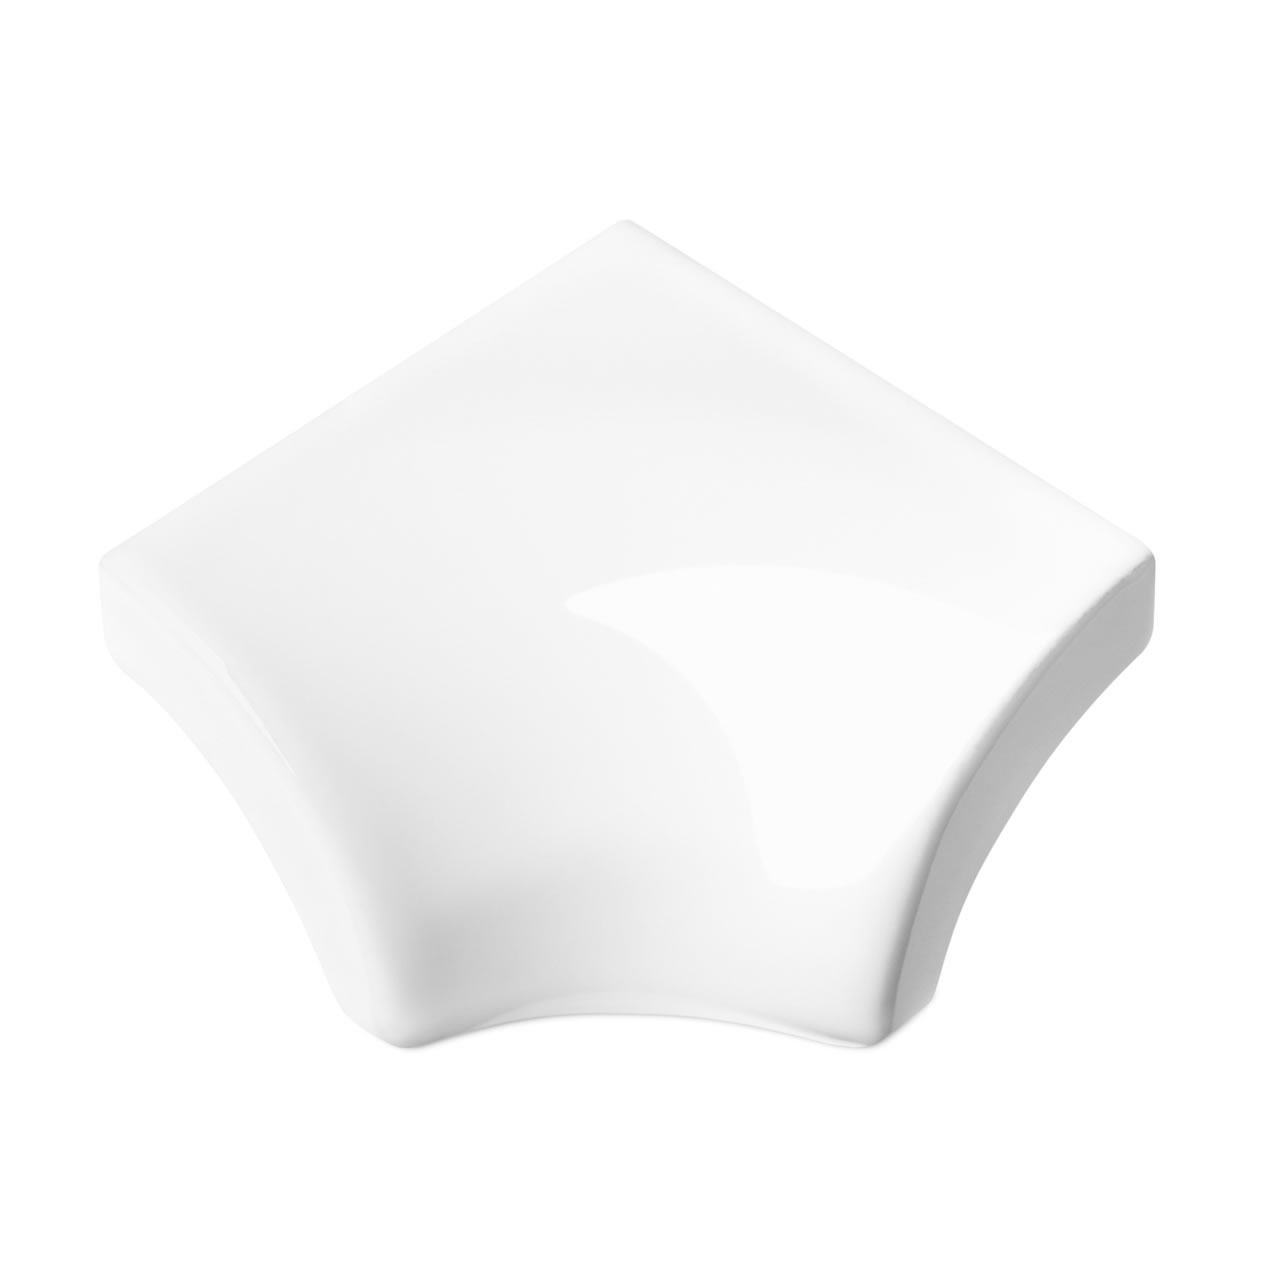 Piscina esquina blanca externa 2.5×2,5